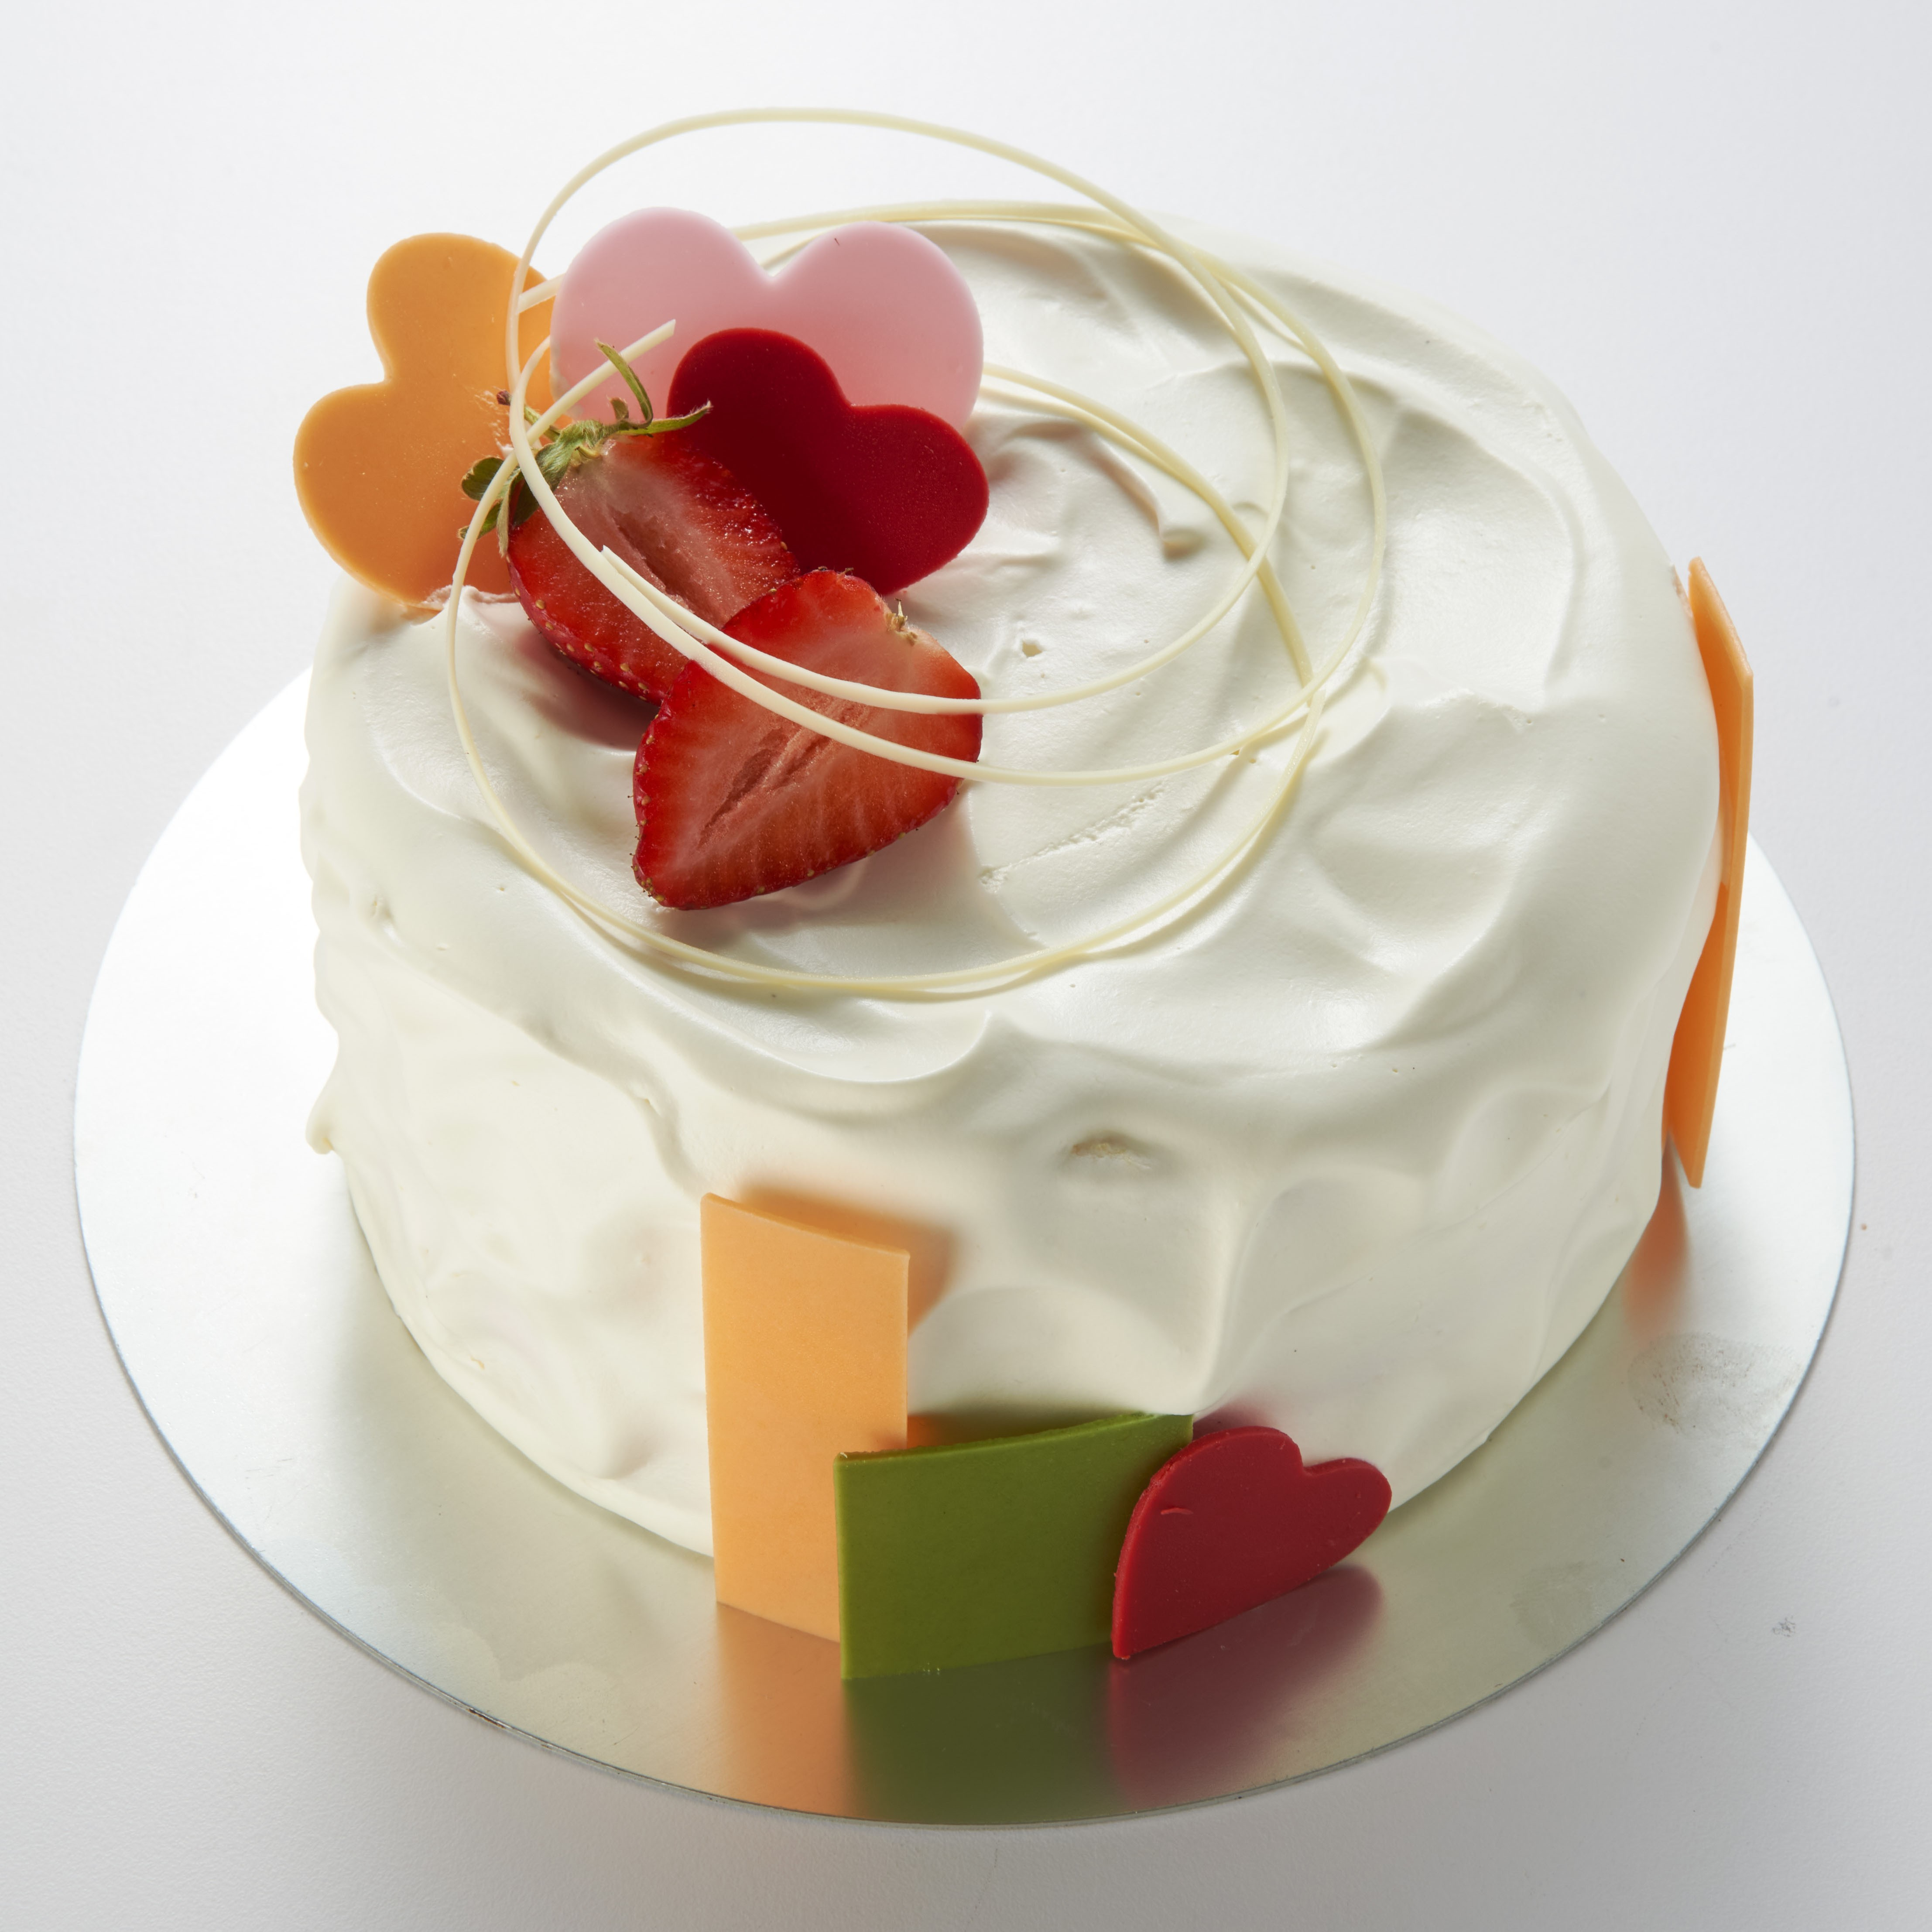 TDH貓茶町-莓天想你生日蛋糕(限門市自取)